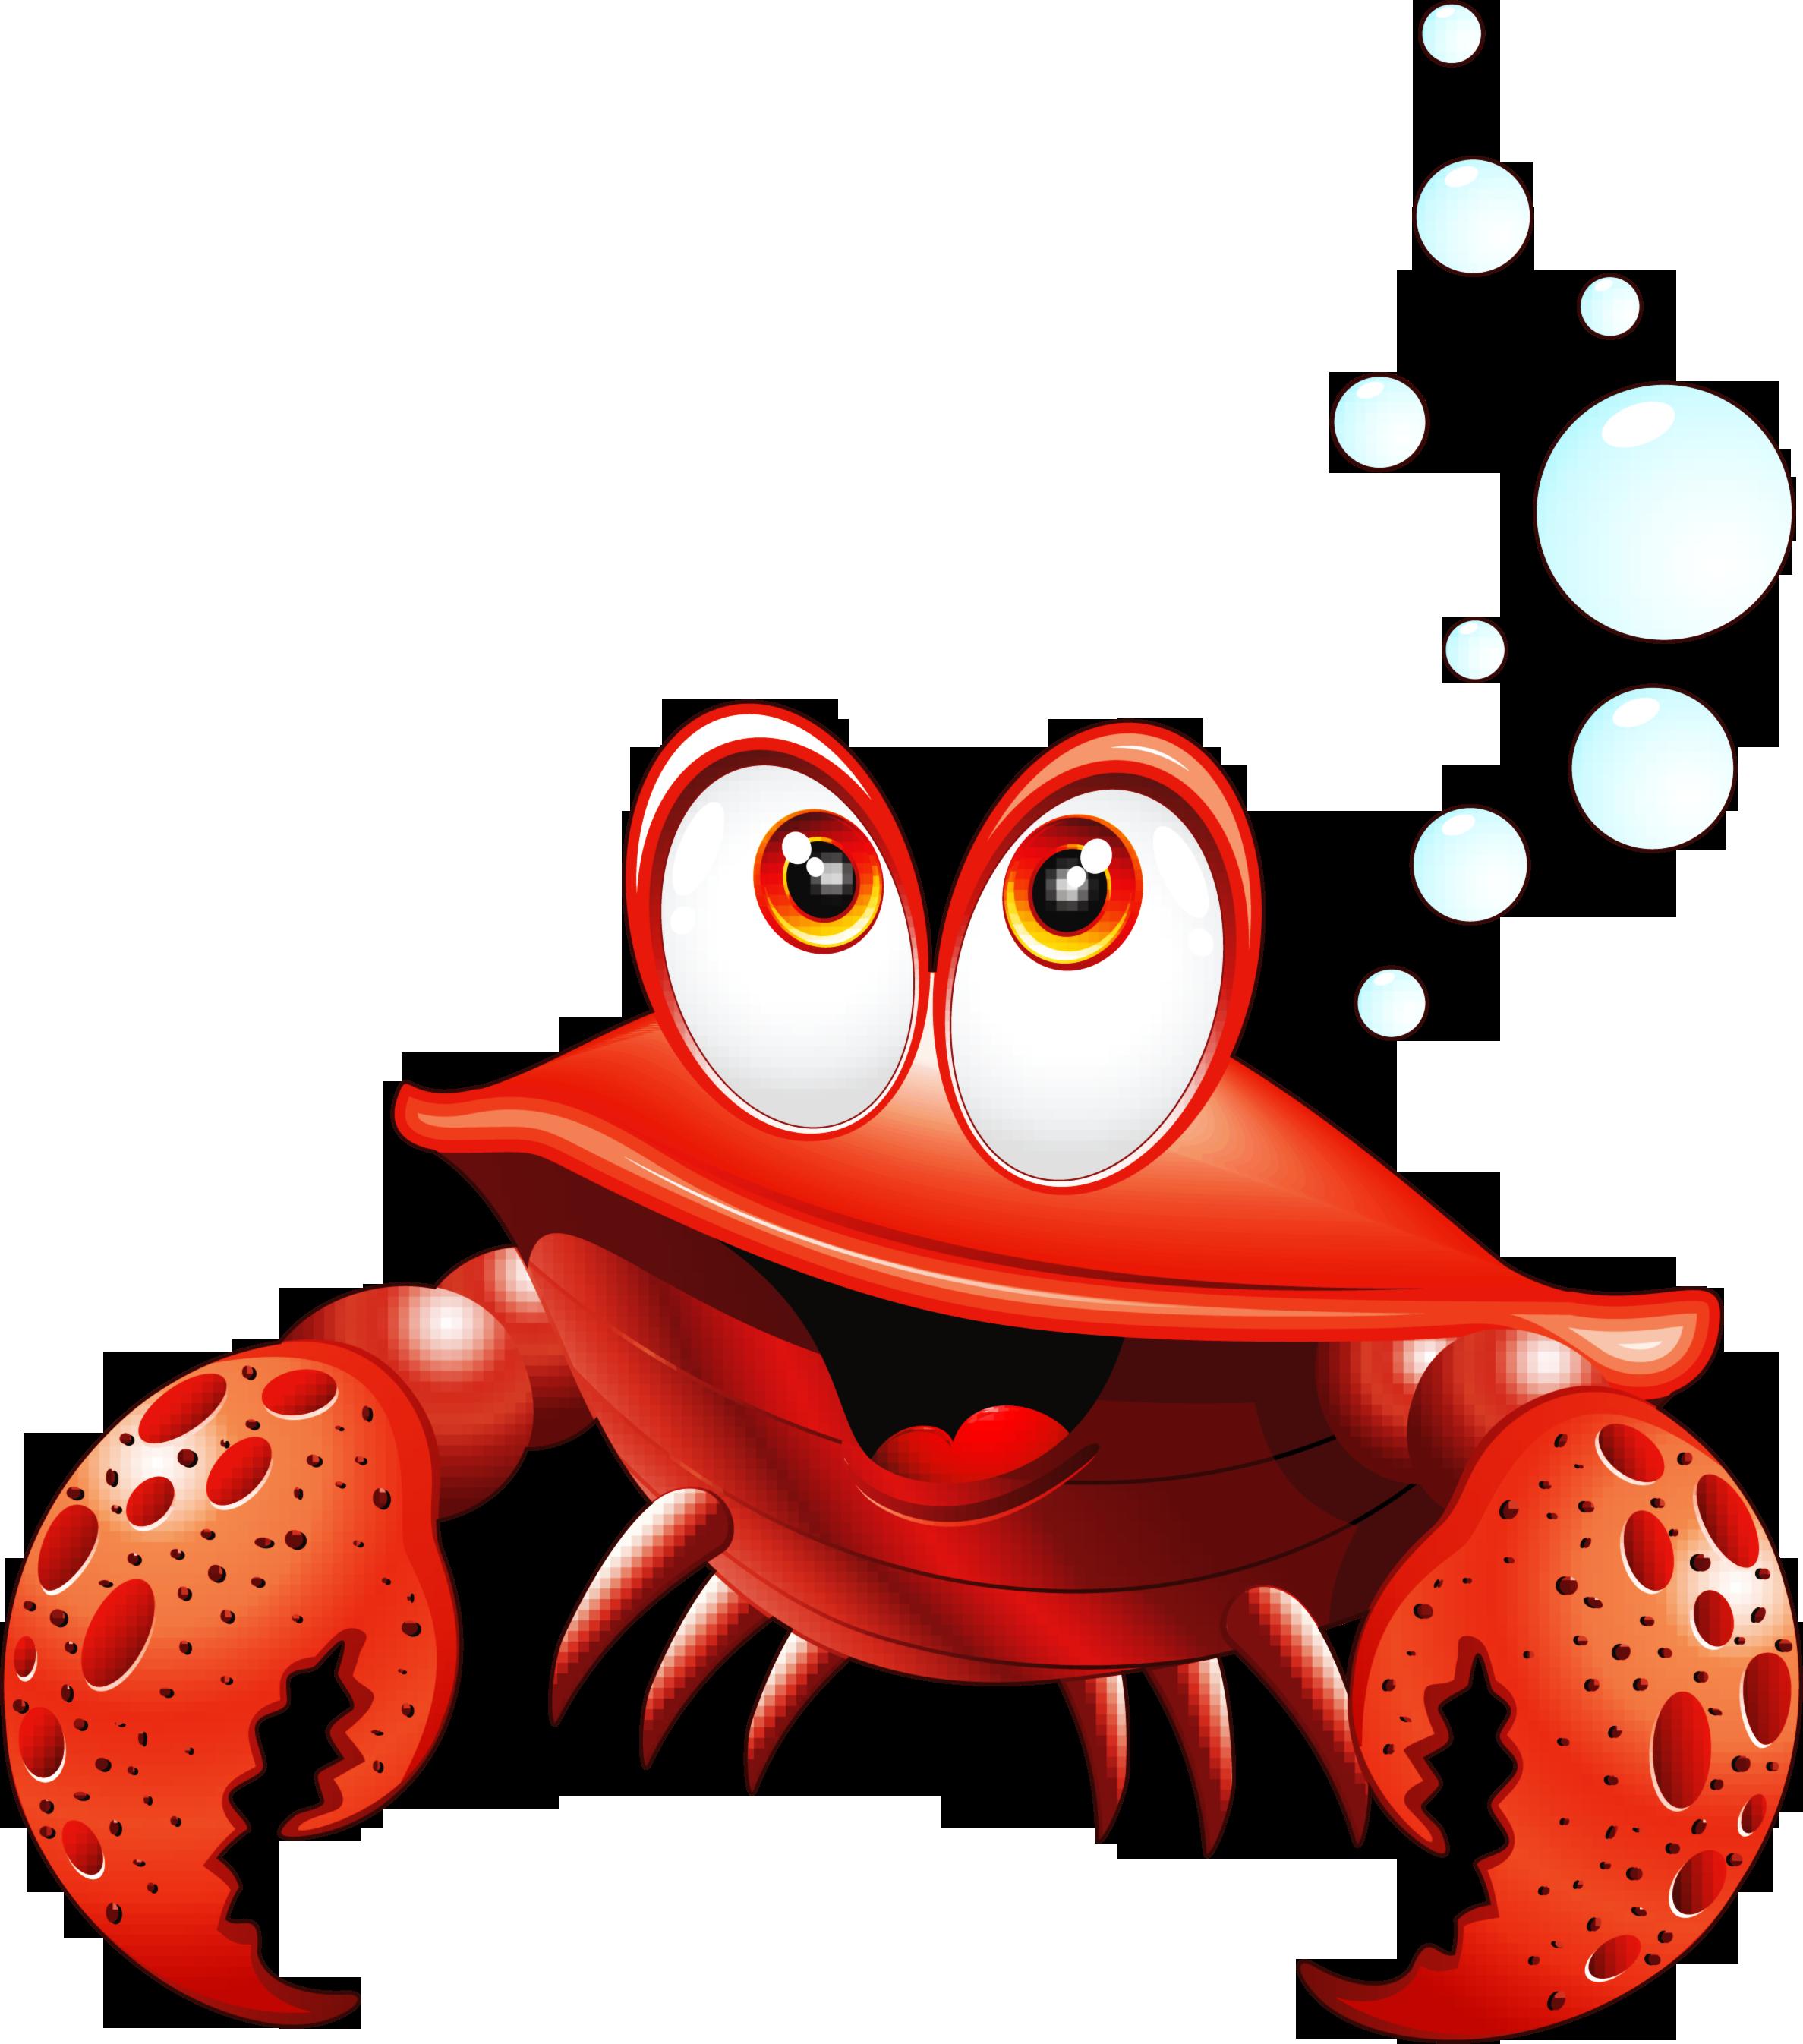 Fish thin clipart jpg royalty free 0_12e33a_5da5c807_orig.png (2375×2692) | детское | Pinterest jpg royalty free